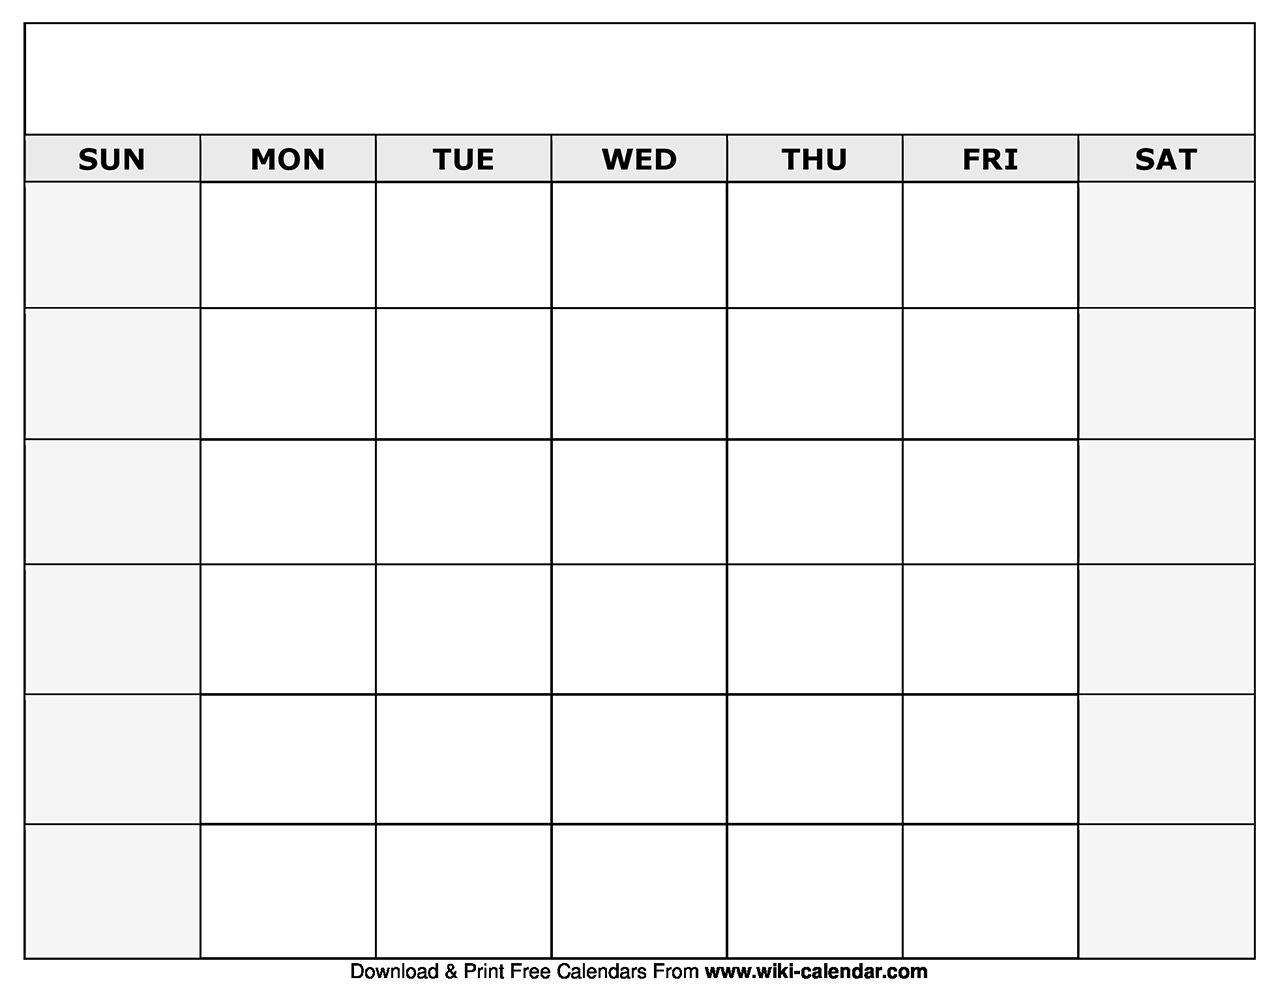 Printable Blank Calendar Templates | Blank Monthly throughout Free Printable Monthly Calendar Pages With Lines